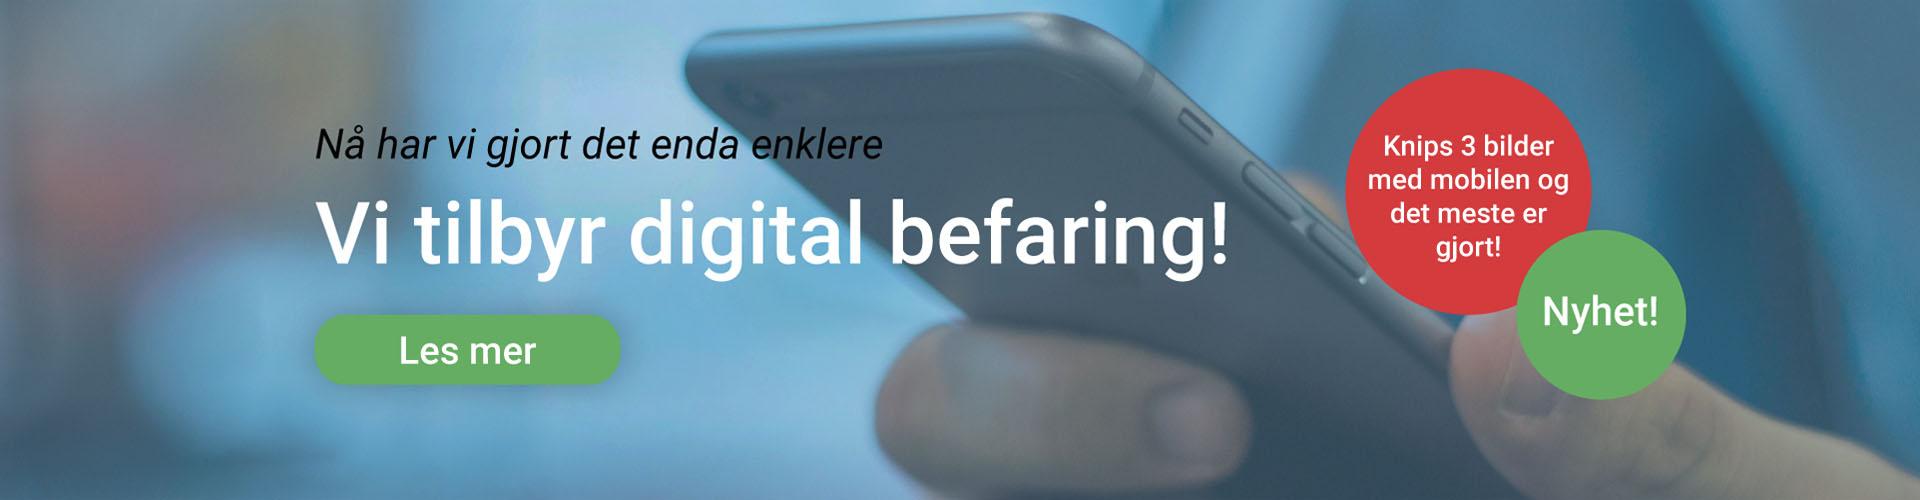 Digital befaring elektriker Molde